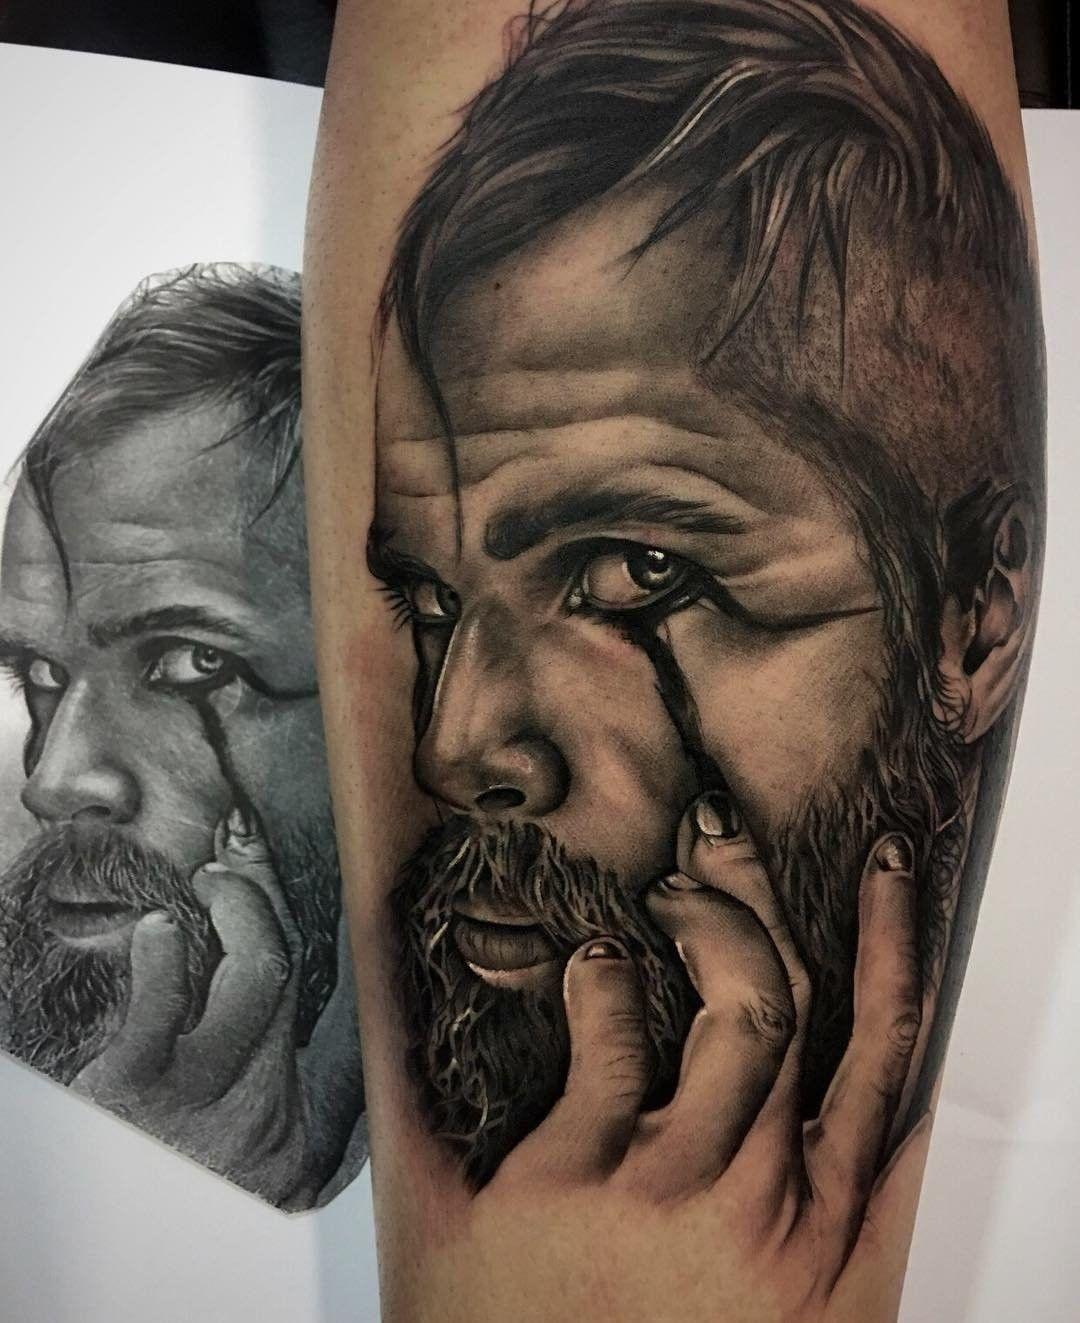 followforfollow,followme,follow,ciudadreal,tattoos,ciudadrealtattoo,tattooshop,tattooers,besttattooers,juantabasco,ciudadrealsetatua,ink,inkmaster,tatuajes,realismo,realistictattoo,ciudadrealtattoo,trap,trapmusic,traptattoo,tspanishrealistictattoos,inked,inkedlife,inkedsociety,art,amazingink,tattooart,oldlines,oldschooltattoo,topclasstattooing